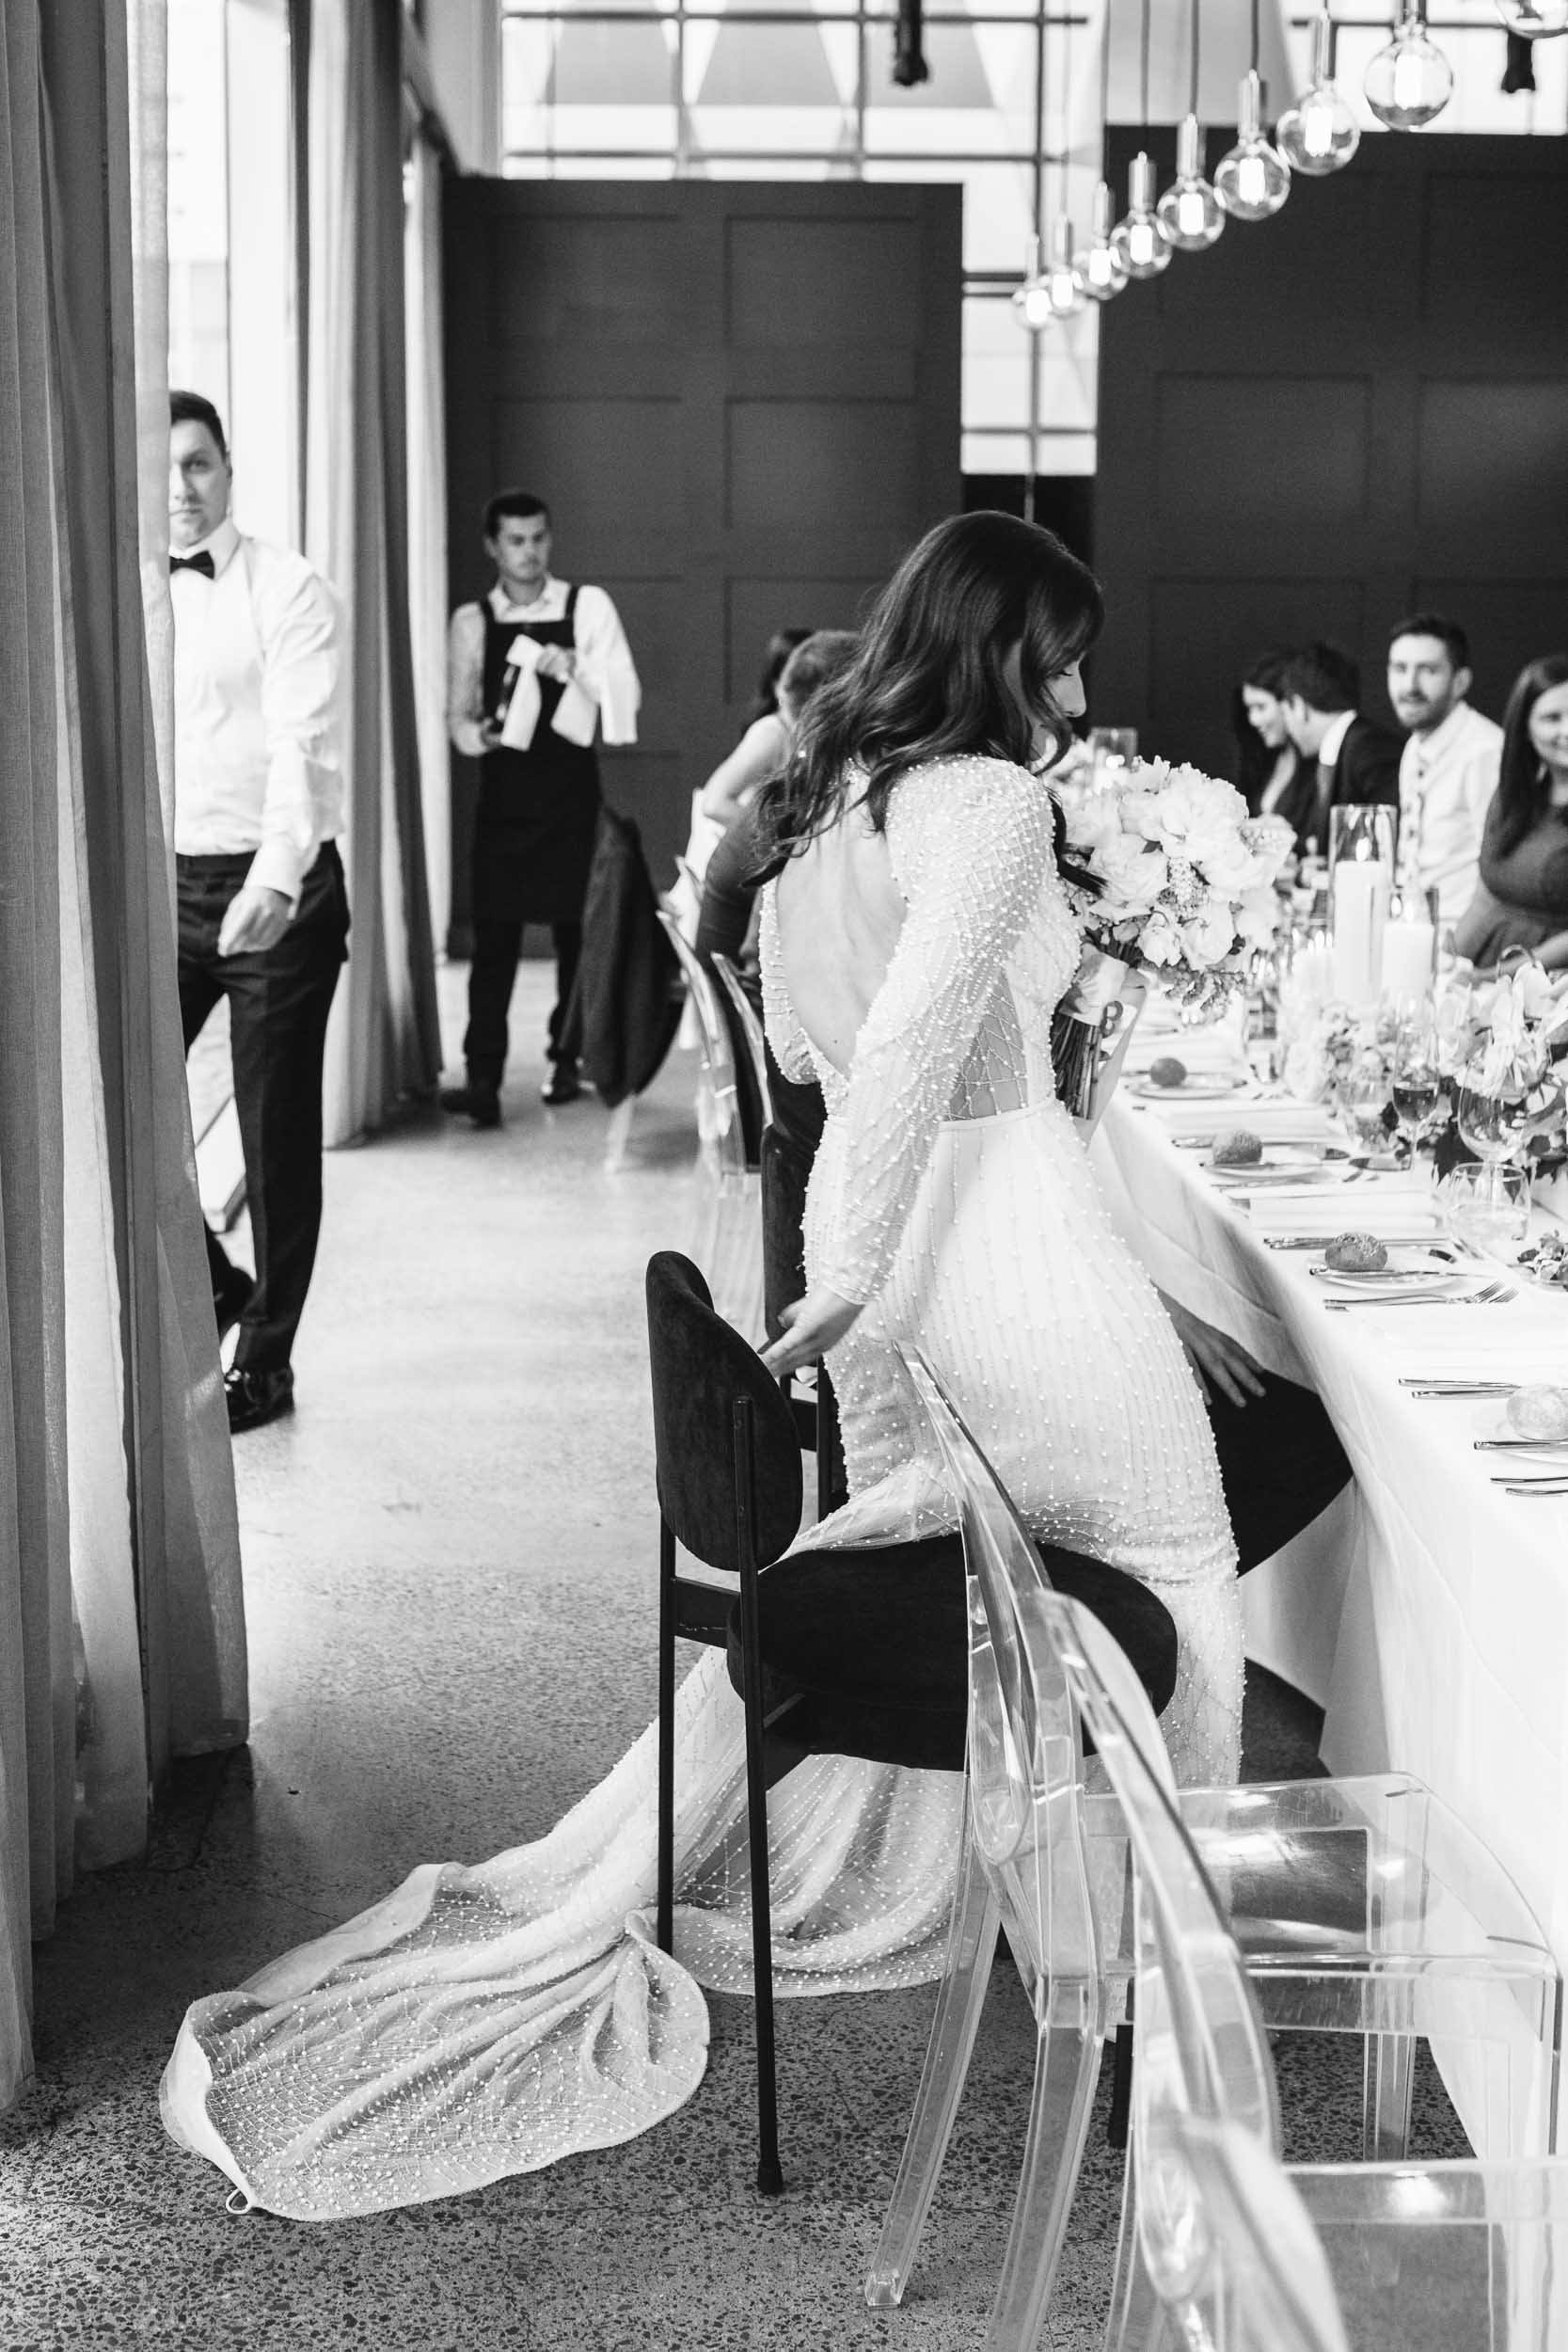 Kas-Richards-Wedding-Photographer-Melbourne-City-Wedding-Alto-Event-Space-Jane-Hill-Bridal-Gown-56.jpg